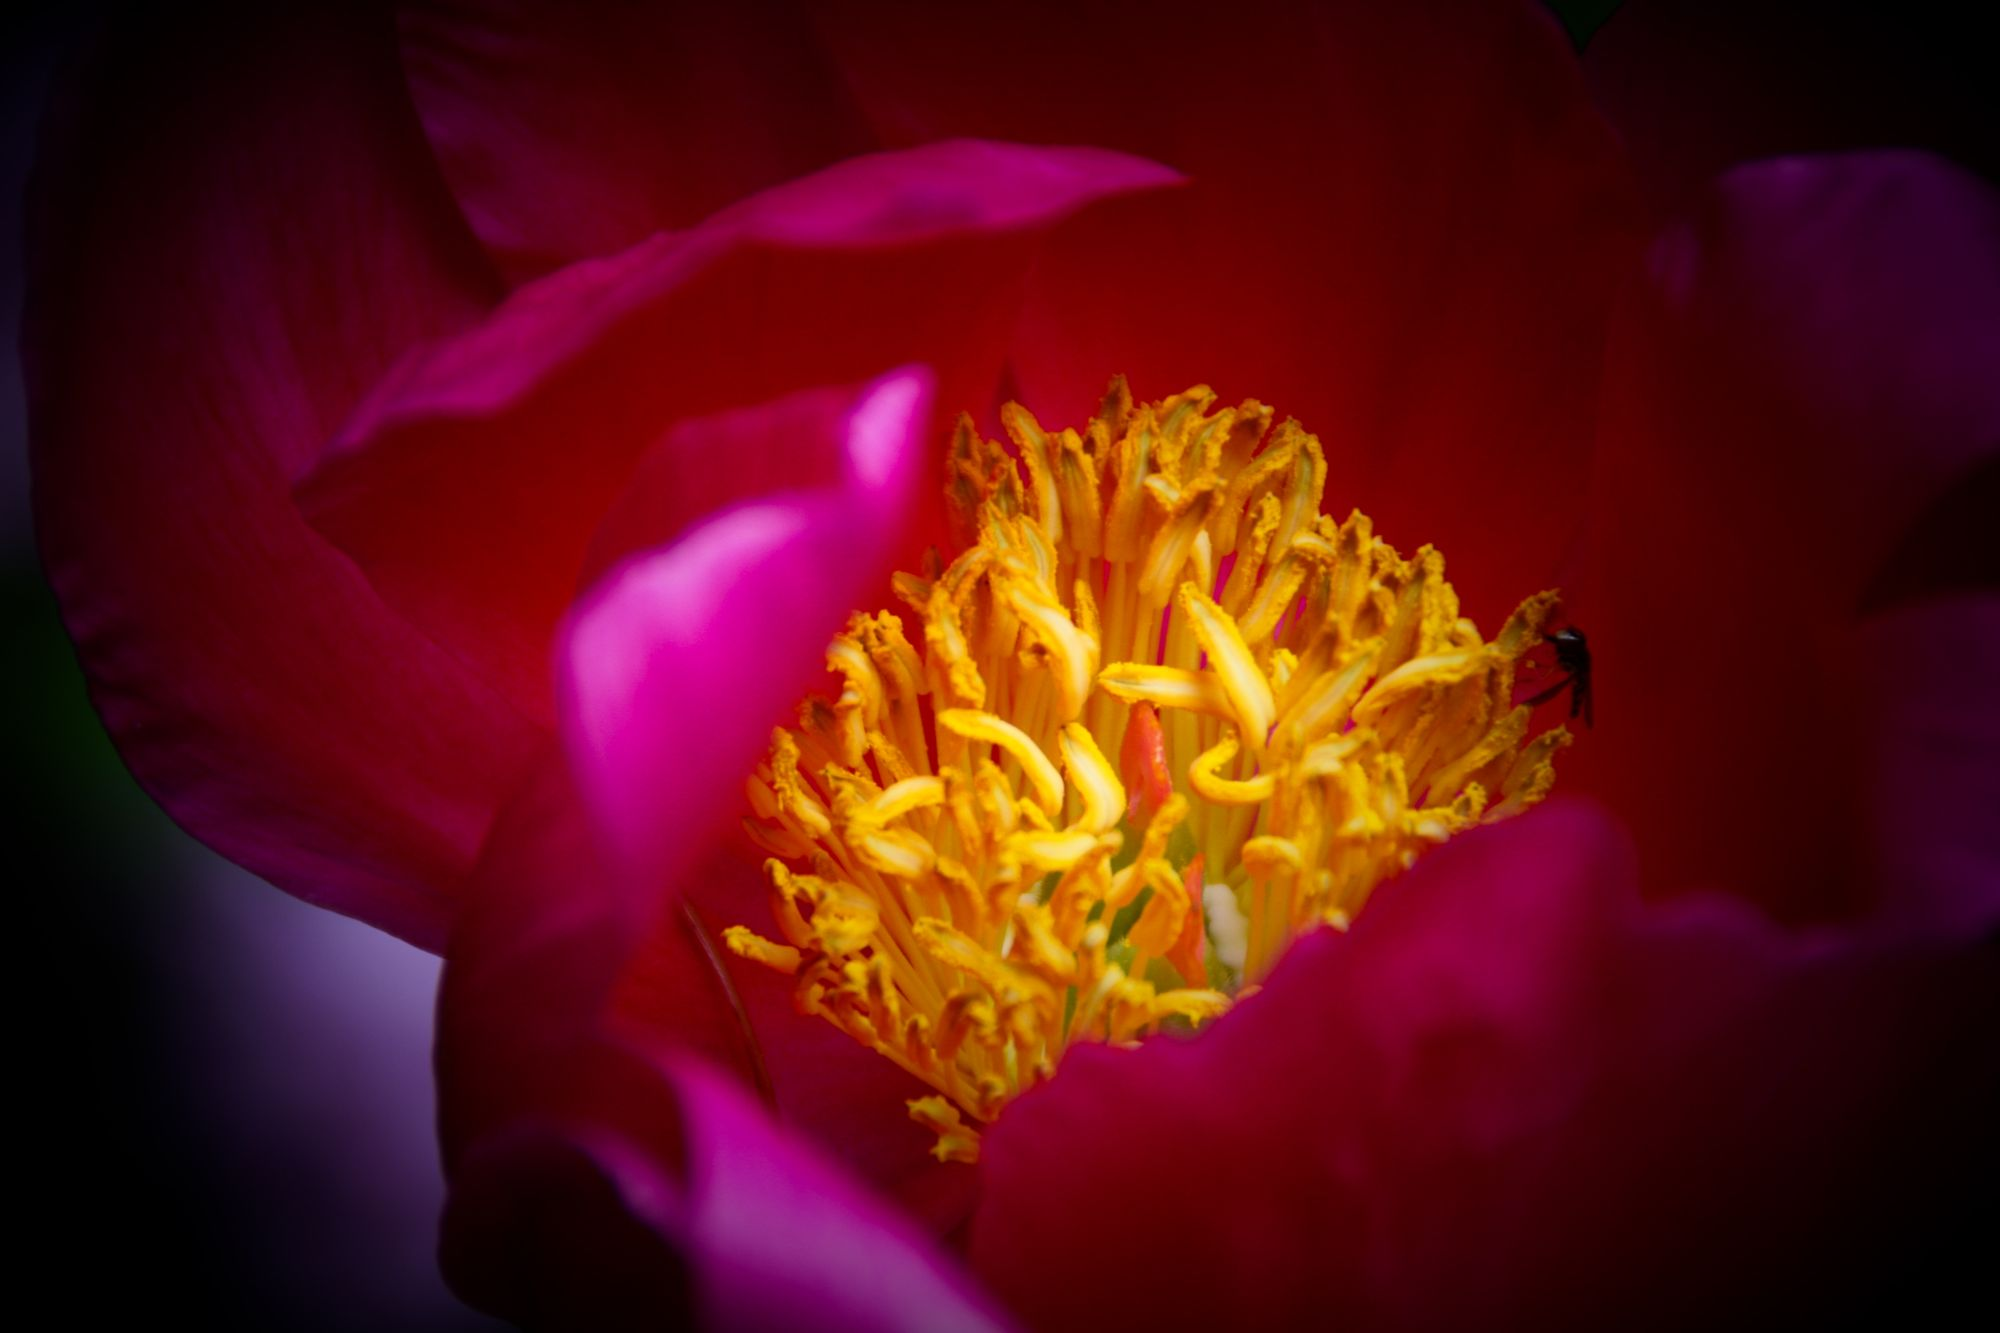 07) Flowers